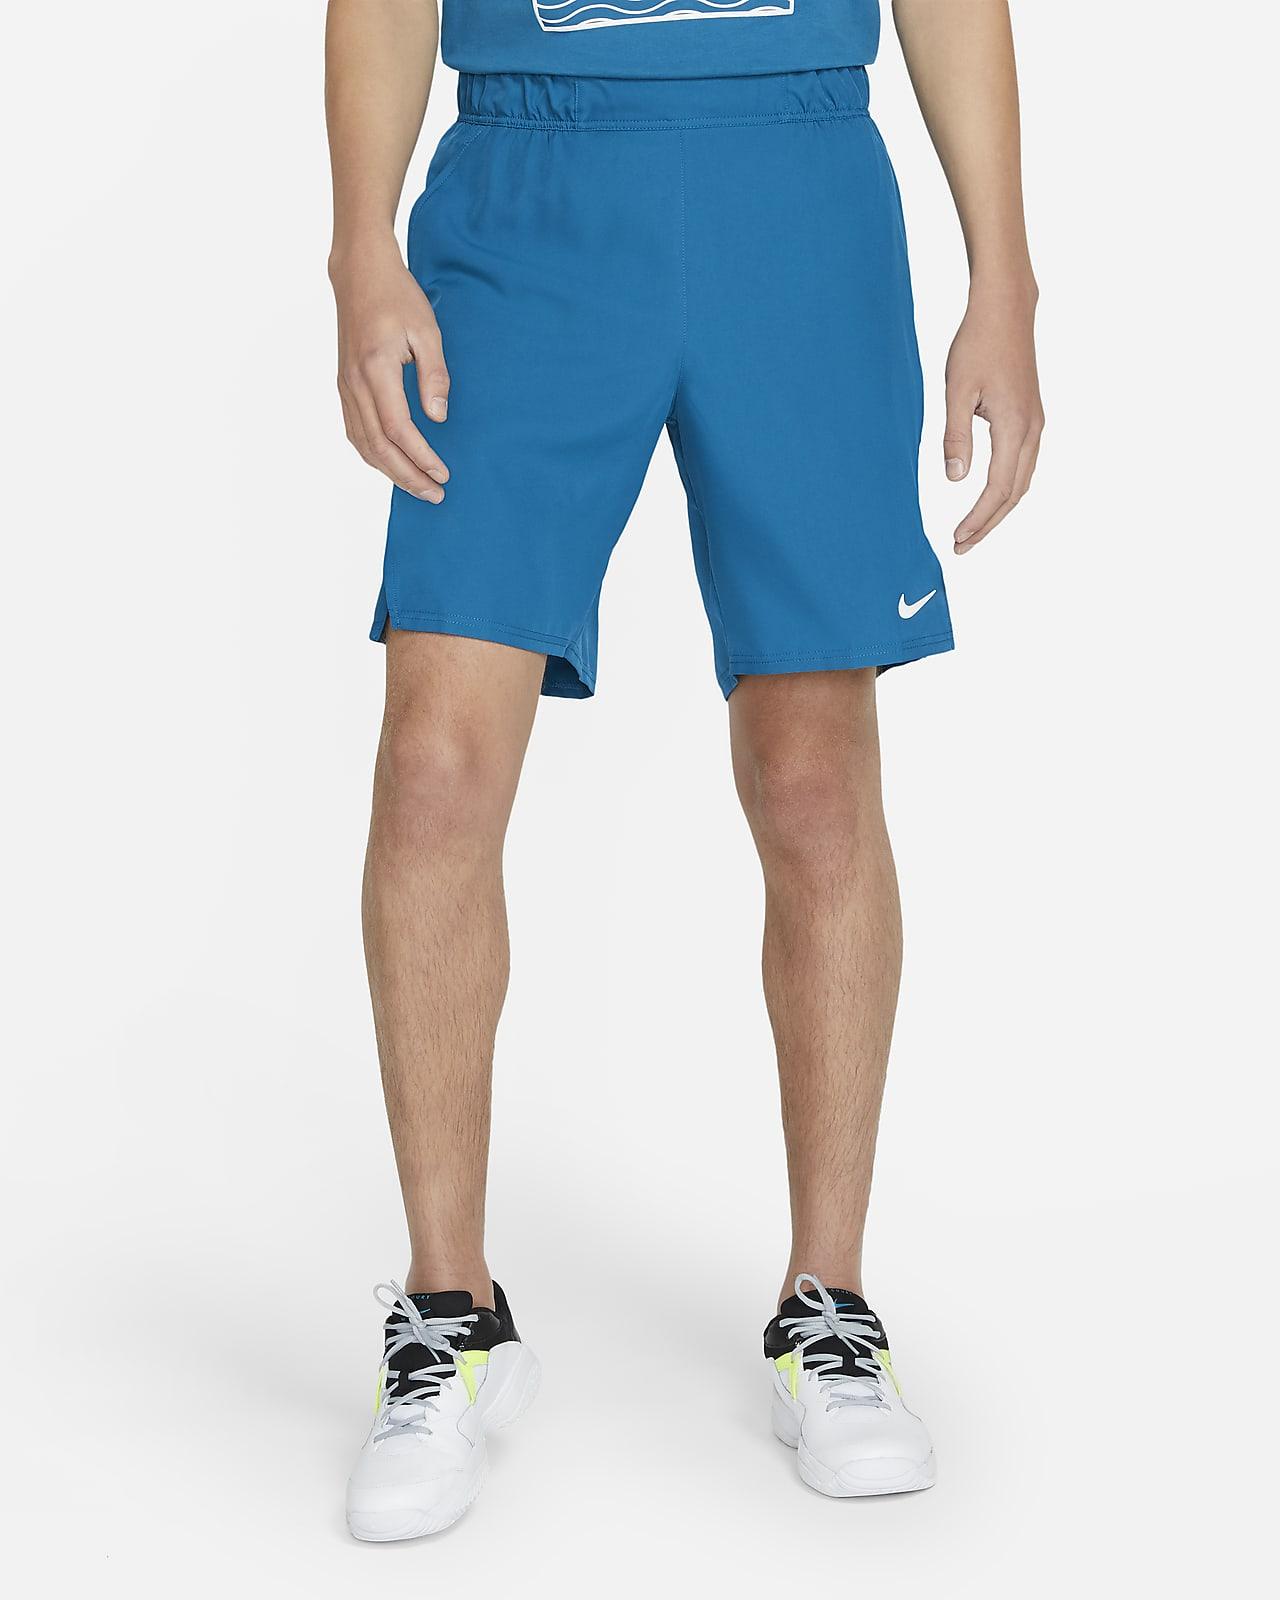 Calções de ténis de 23cm NikeCourt Dri-FIT Victory para homem